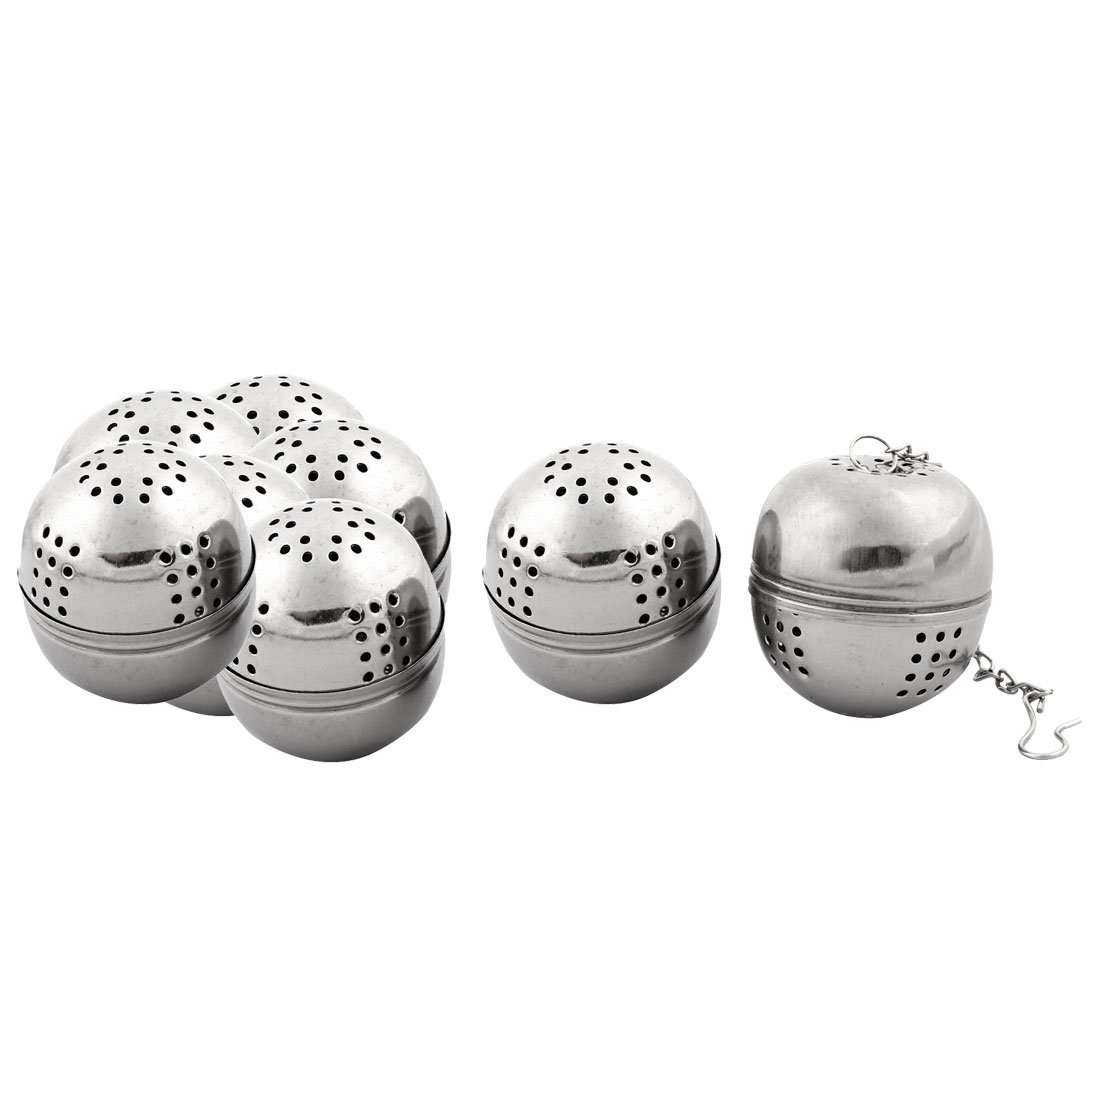 OKSLO Stainless steel leaf tea spice perfume infuser strainer ball 4cm dia 8 pcs